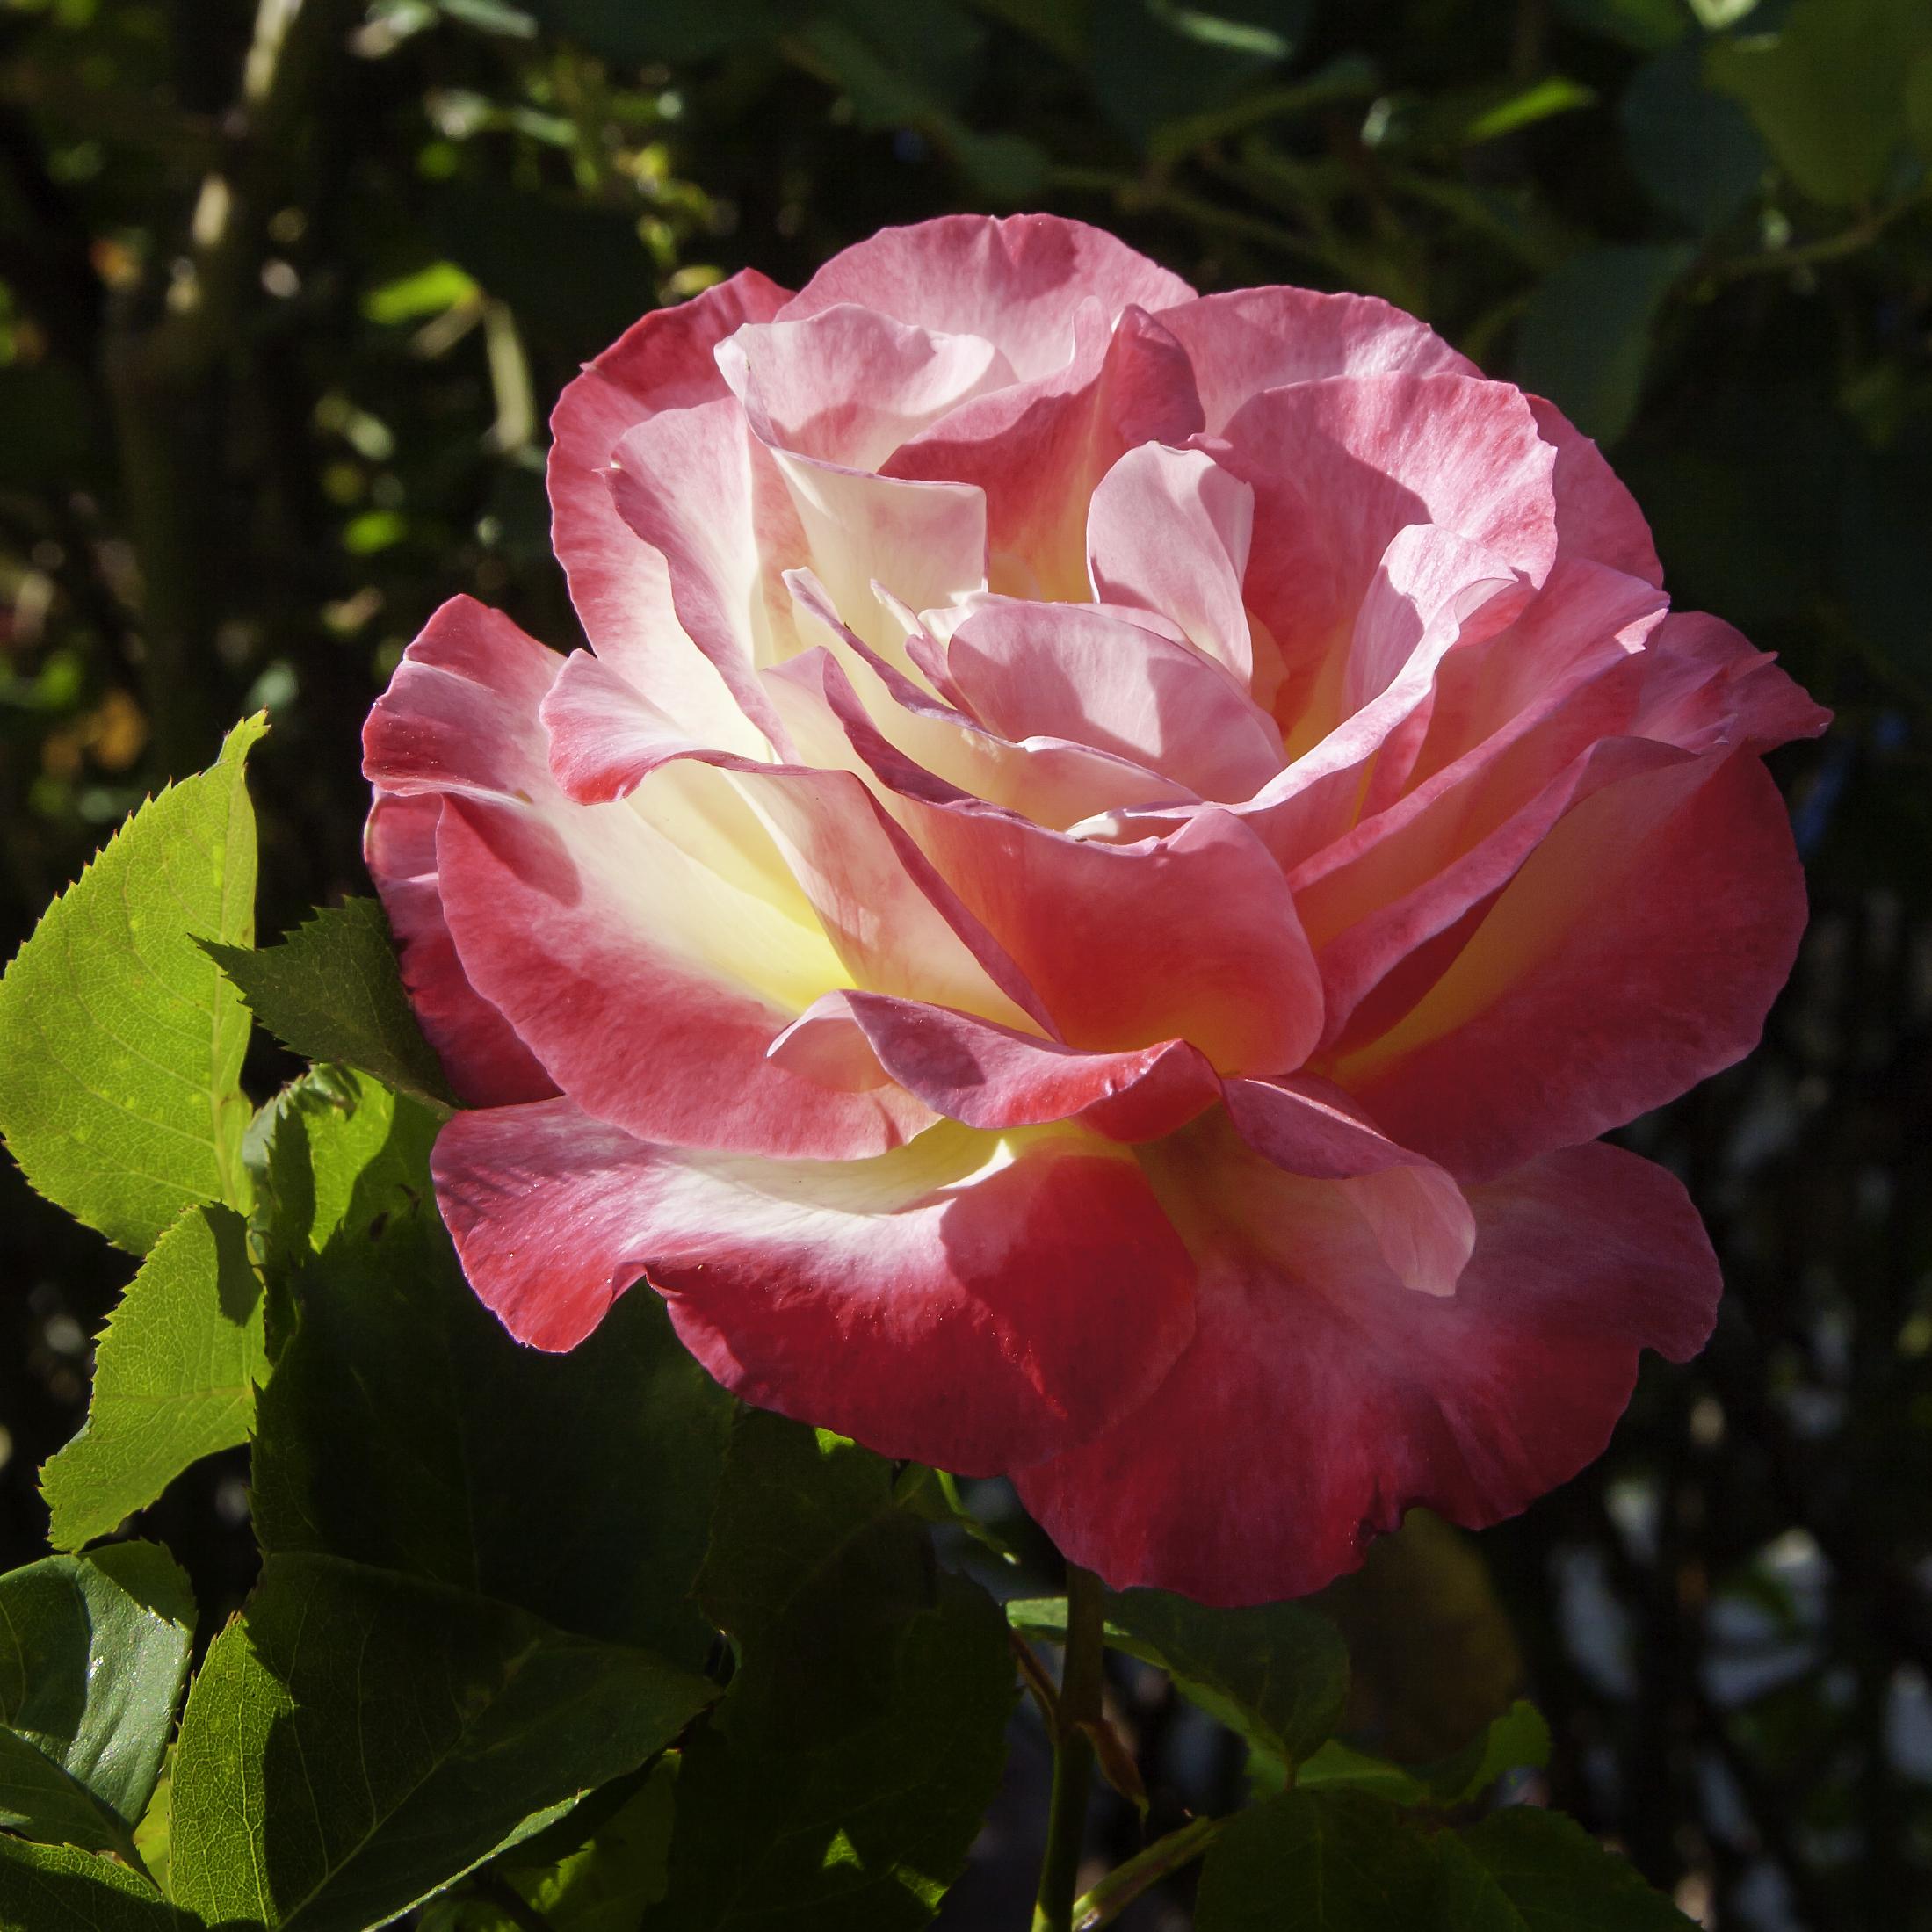 Fotos gratis : flor, pétalo, rosado, flora, Floribunda, Detalles ...